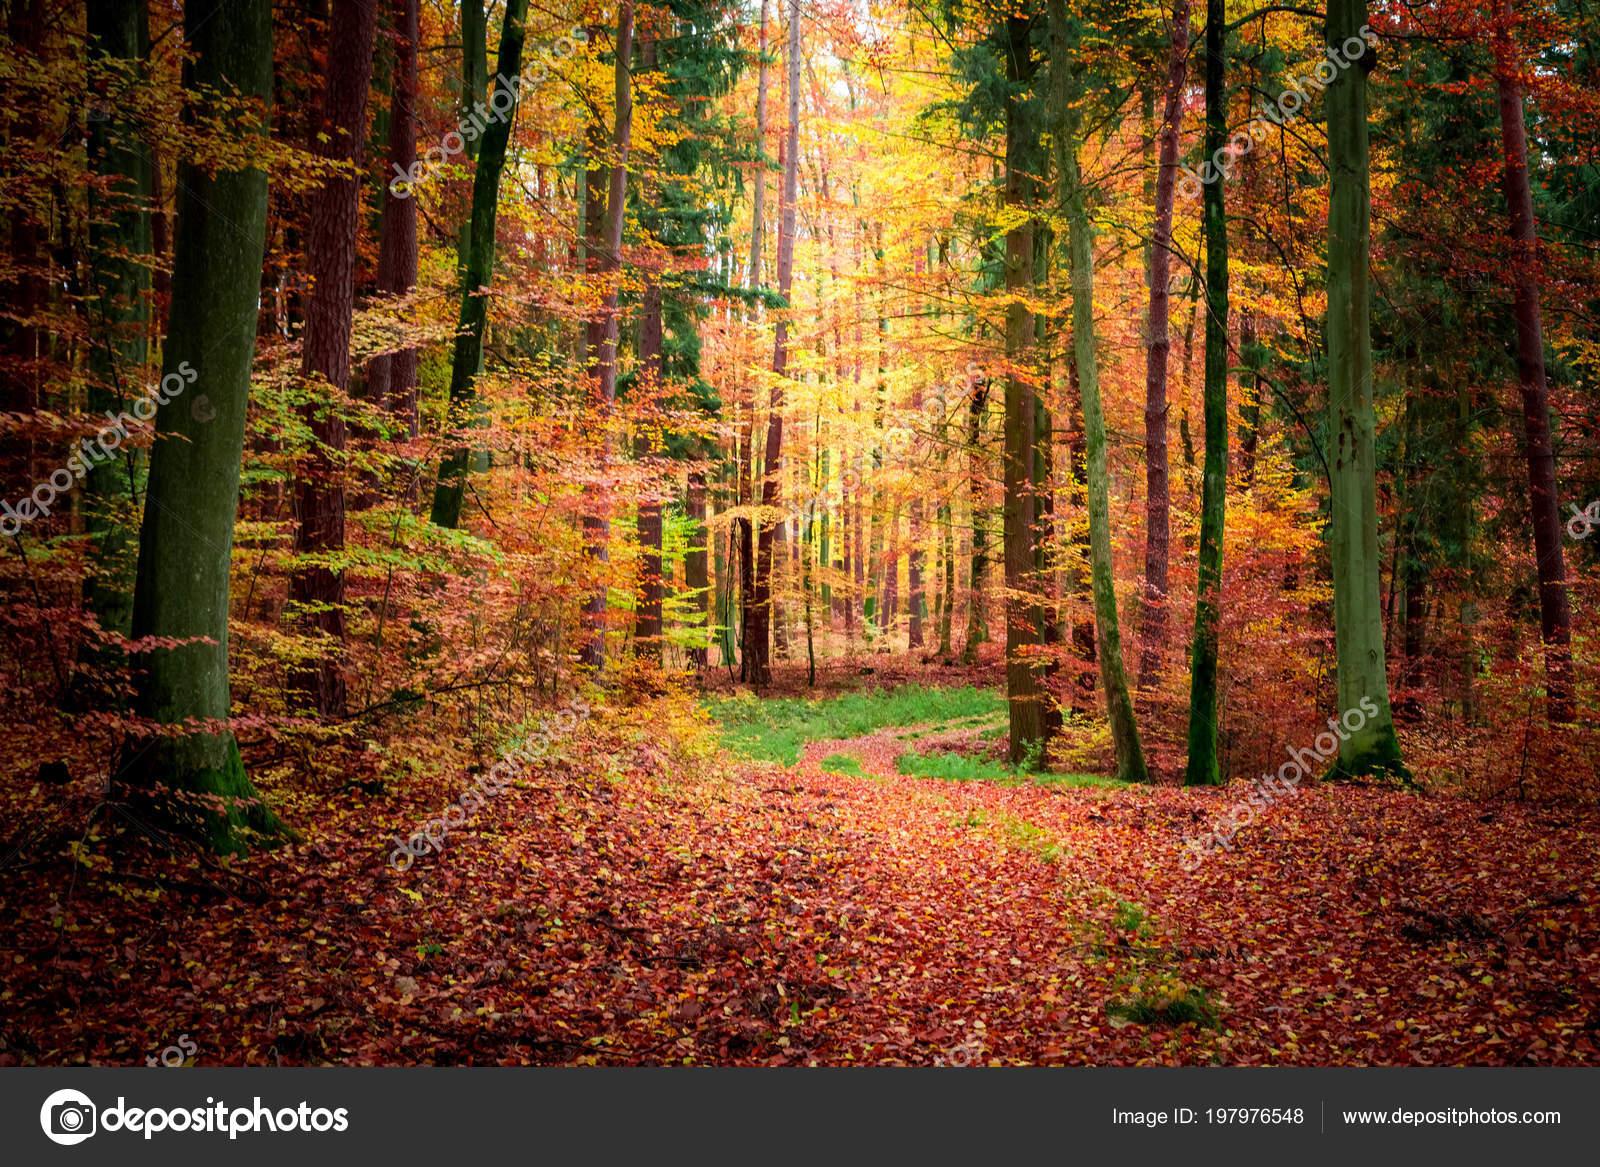 Stunning dark forest fall poland stock photo shaiith79 197976548 stunning dark forest fall poland stock photo publicscrutiny Gallery